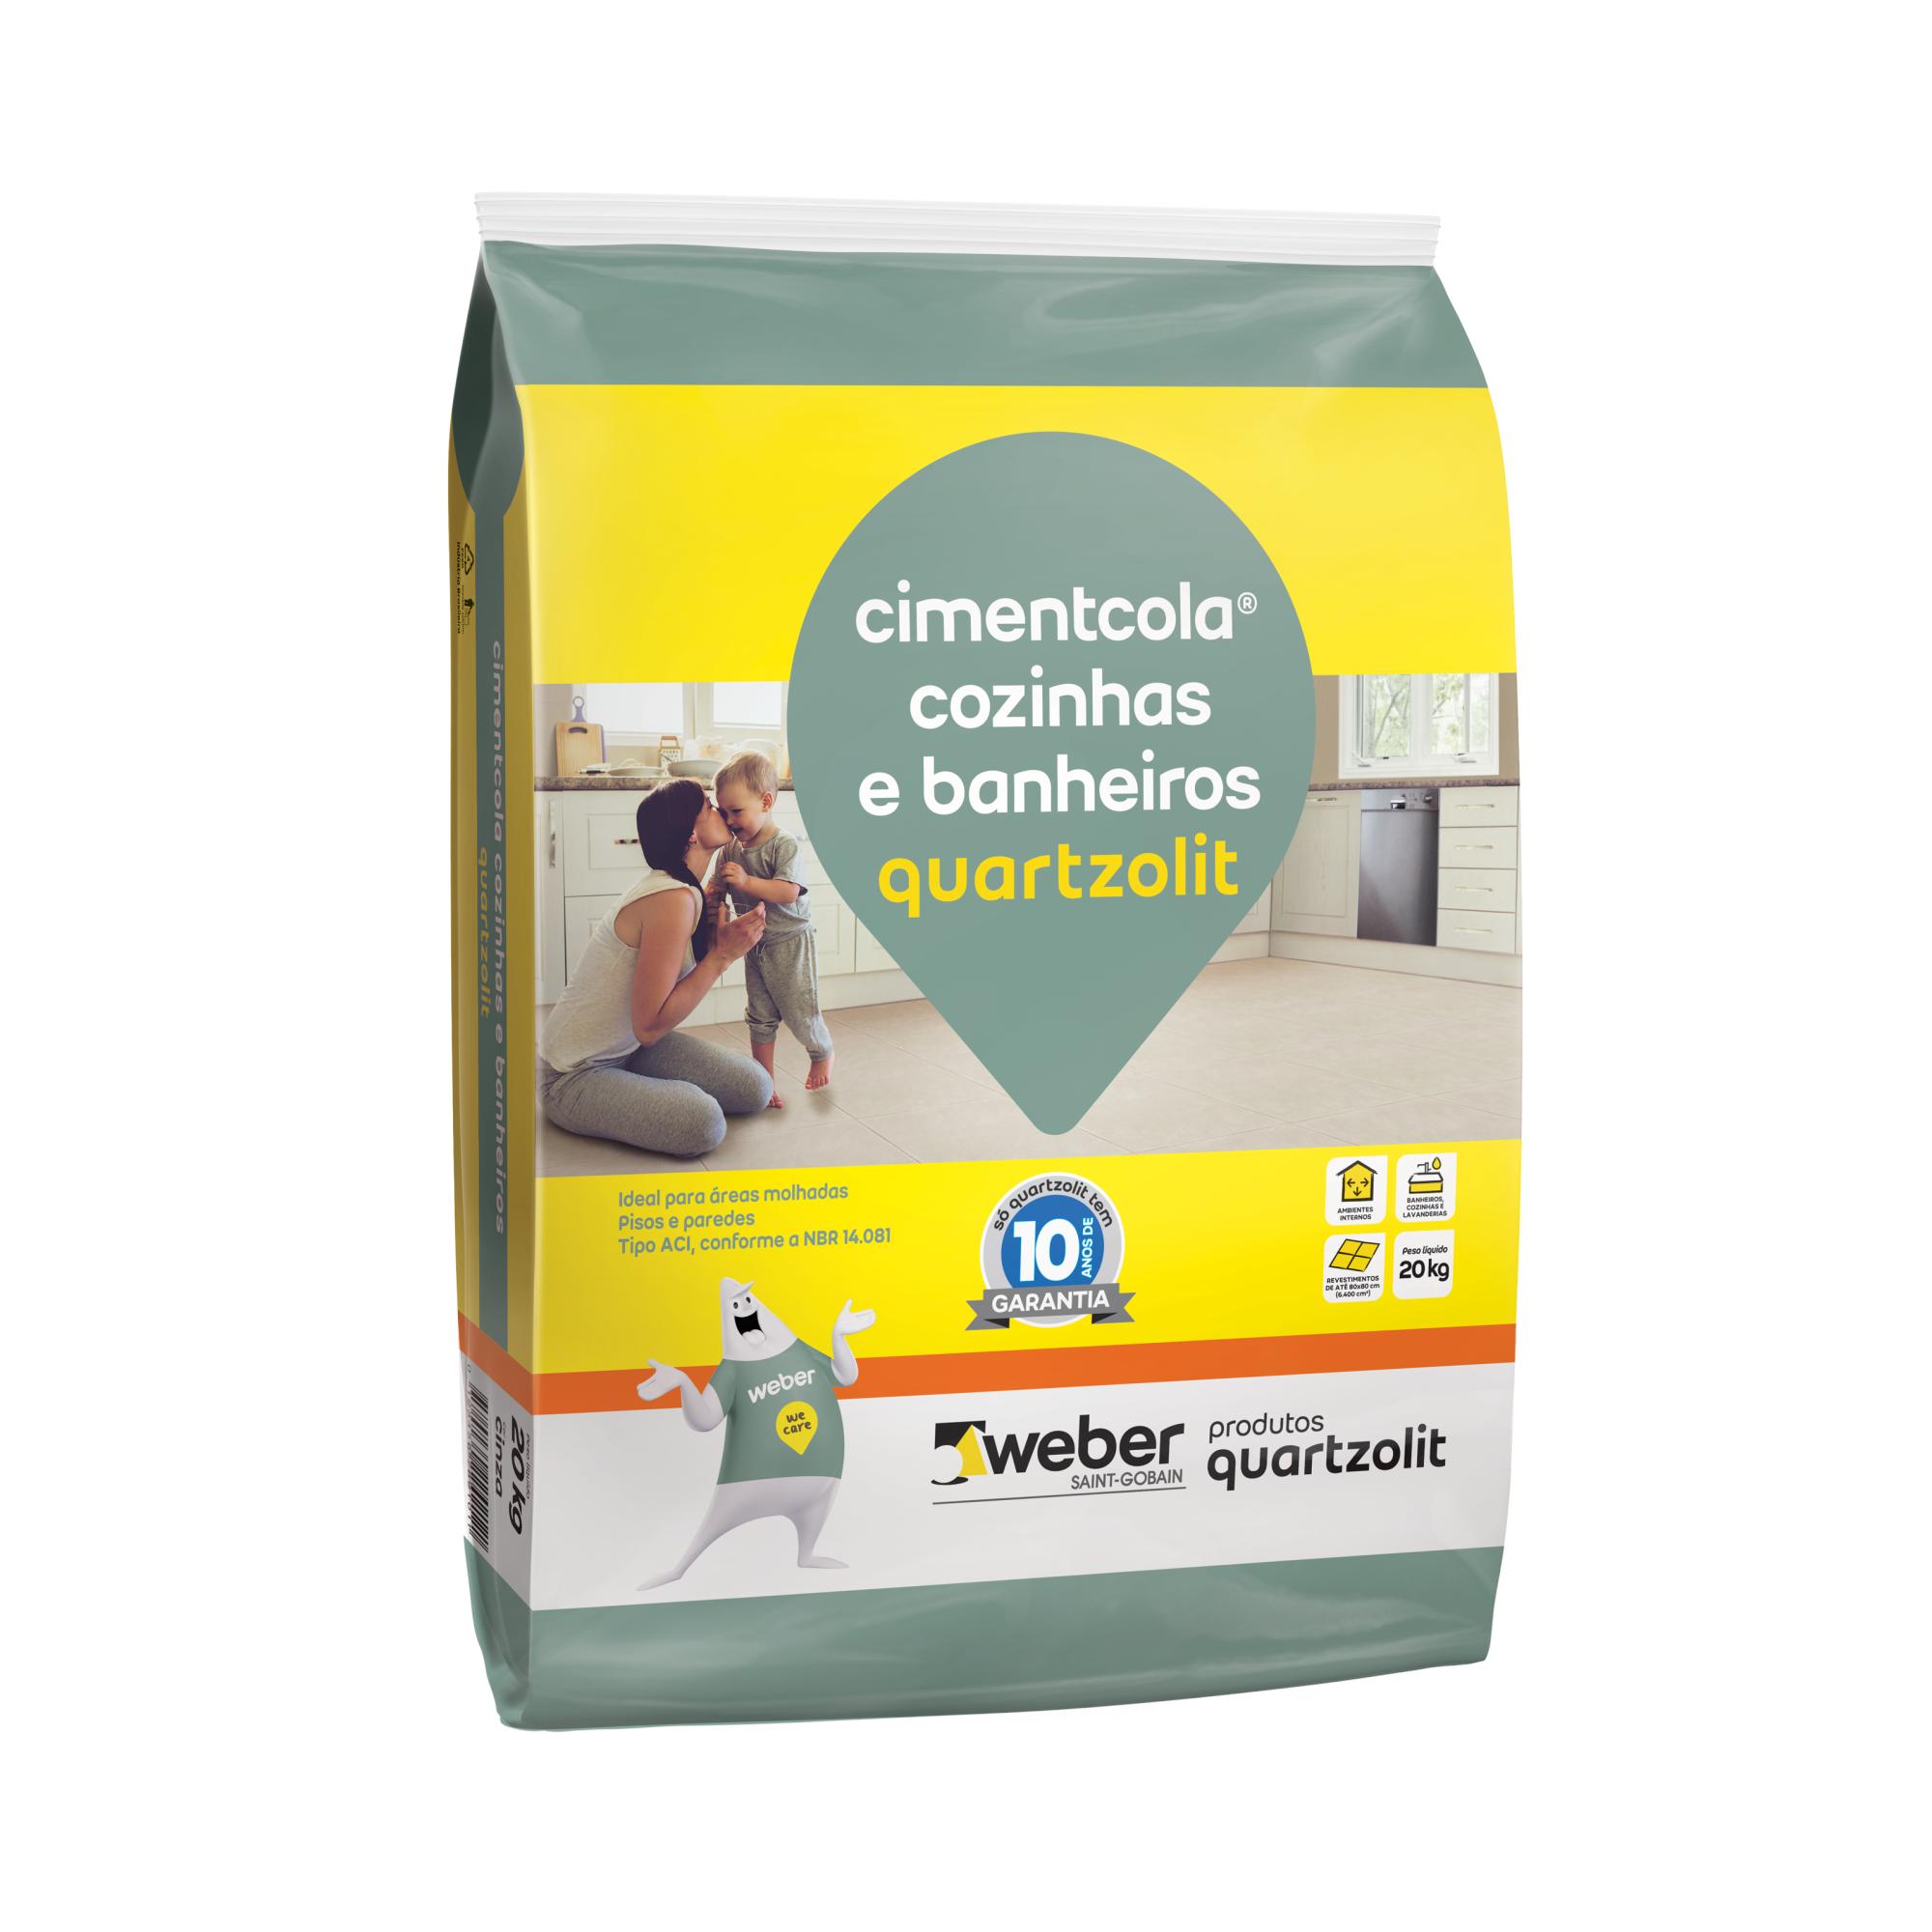 Argamassa ACI Cimentcola CozinhaBanheiro 20kg - Quartzolit